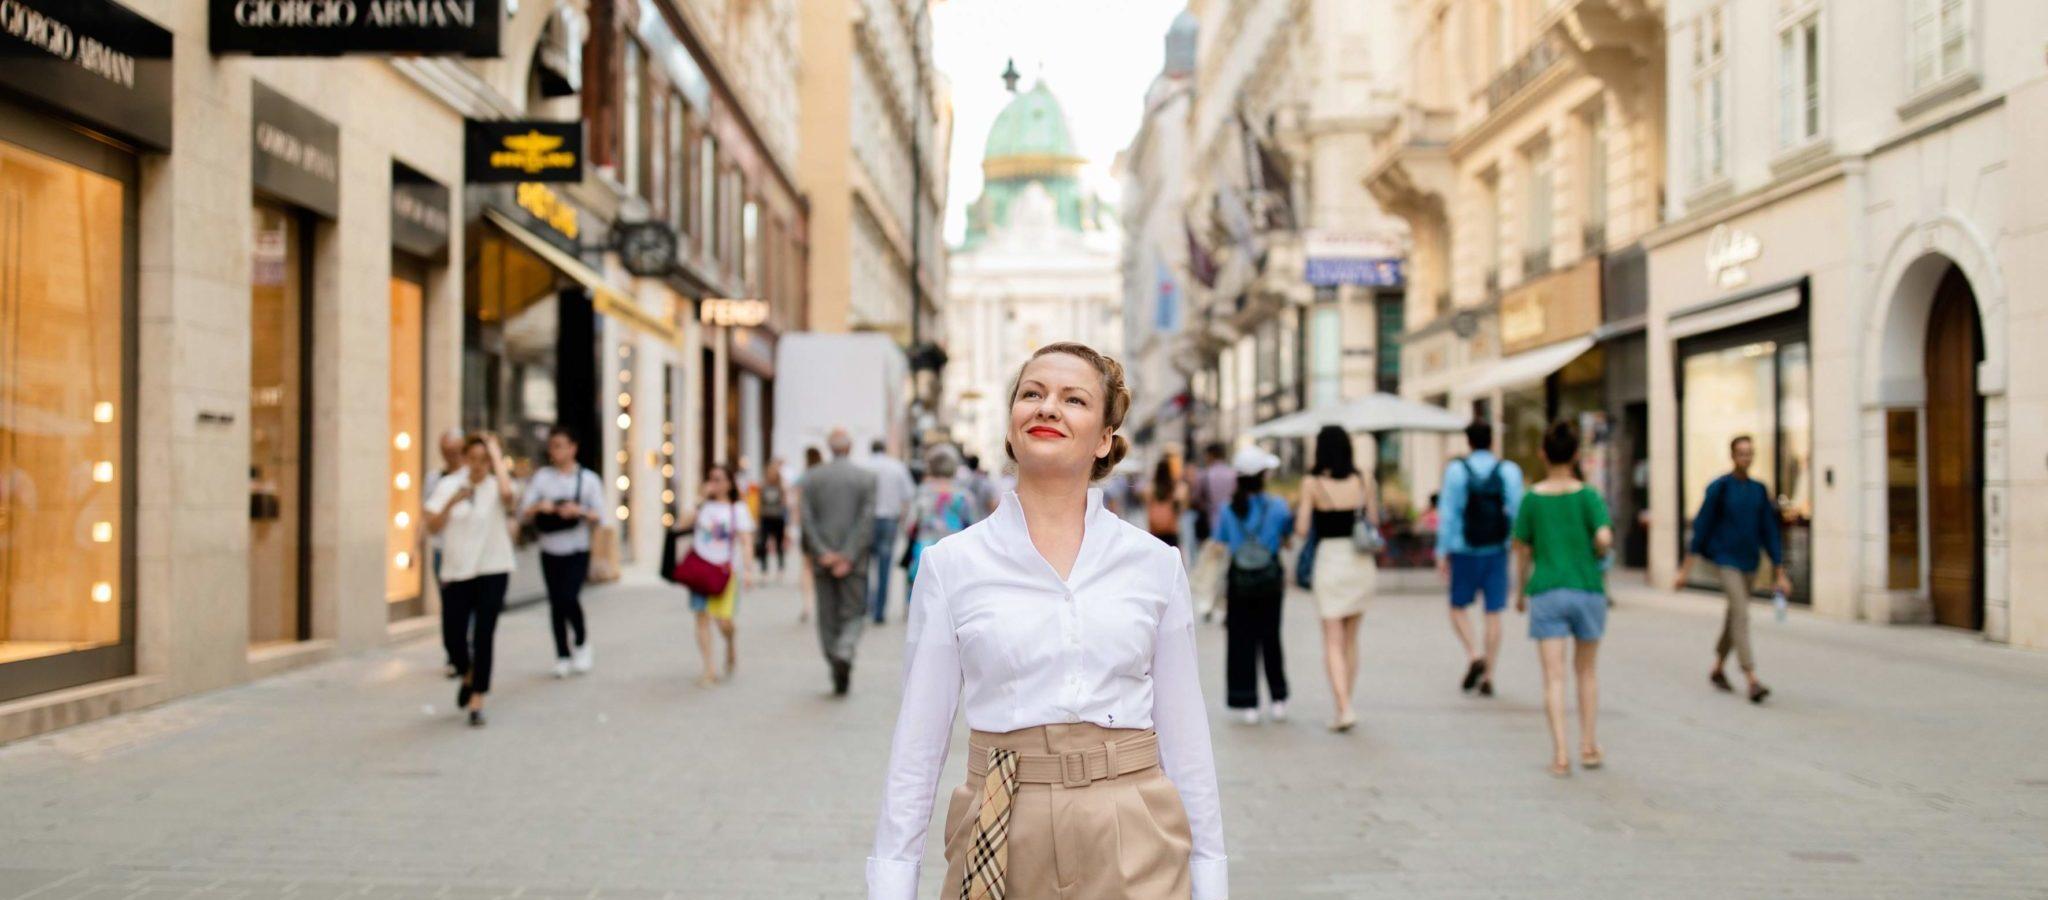 Lina Bibaric, Content Texter und Premium Texter in Wien| LiNAs BÜRO | Foto: © Nicole Heiling